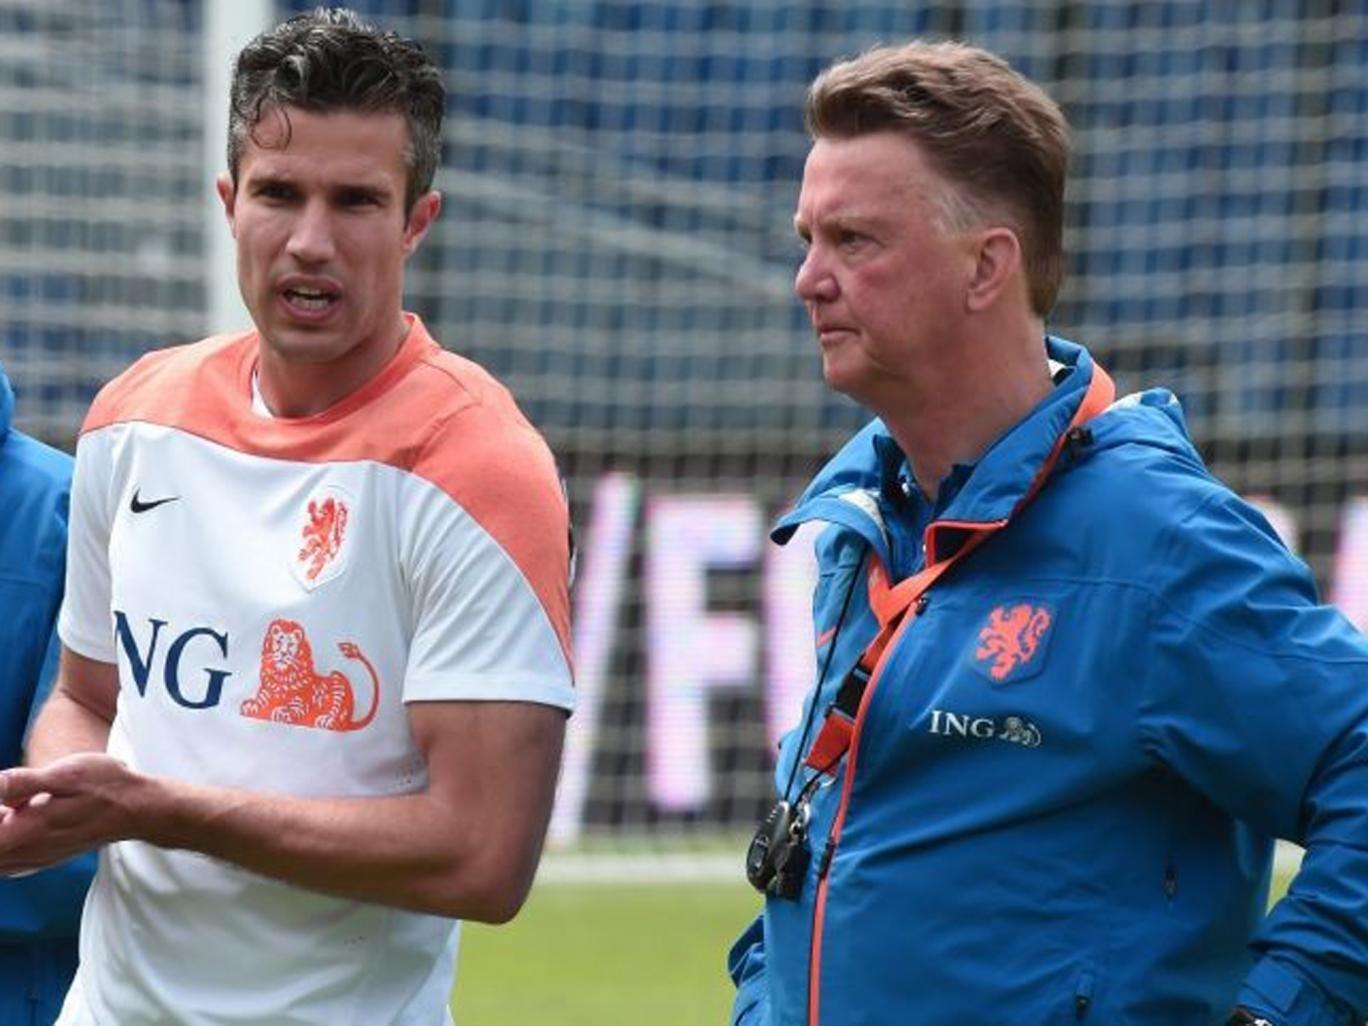 United we stand: Robin van Persie is Louis van Gaal's captain